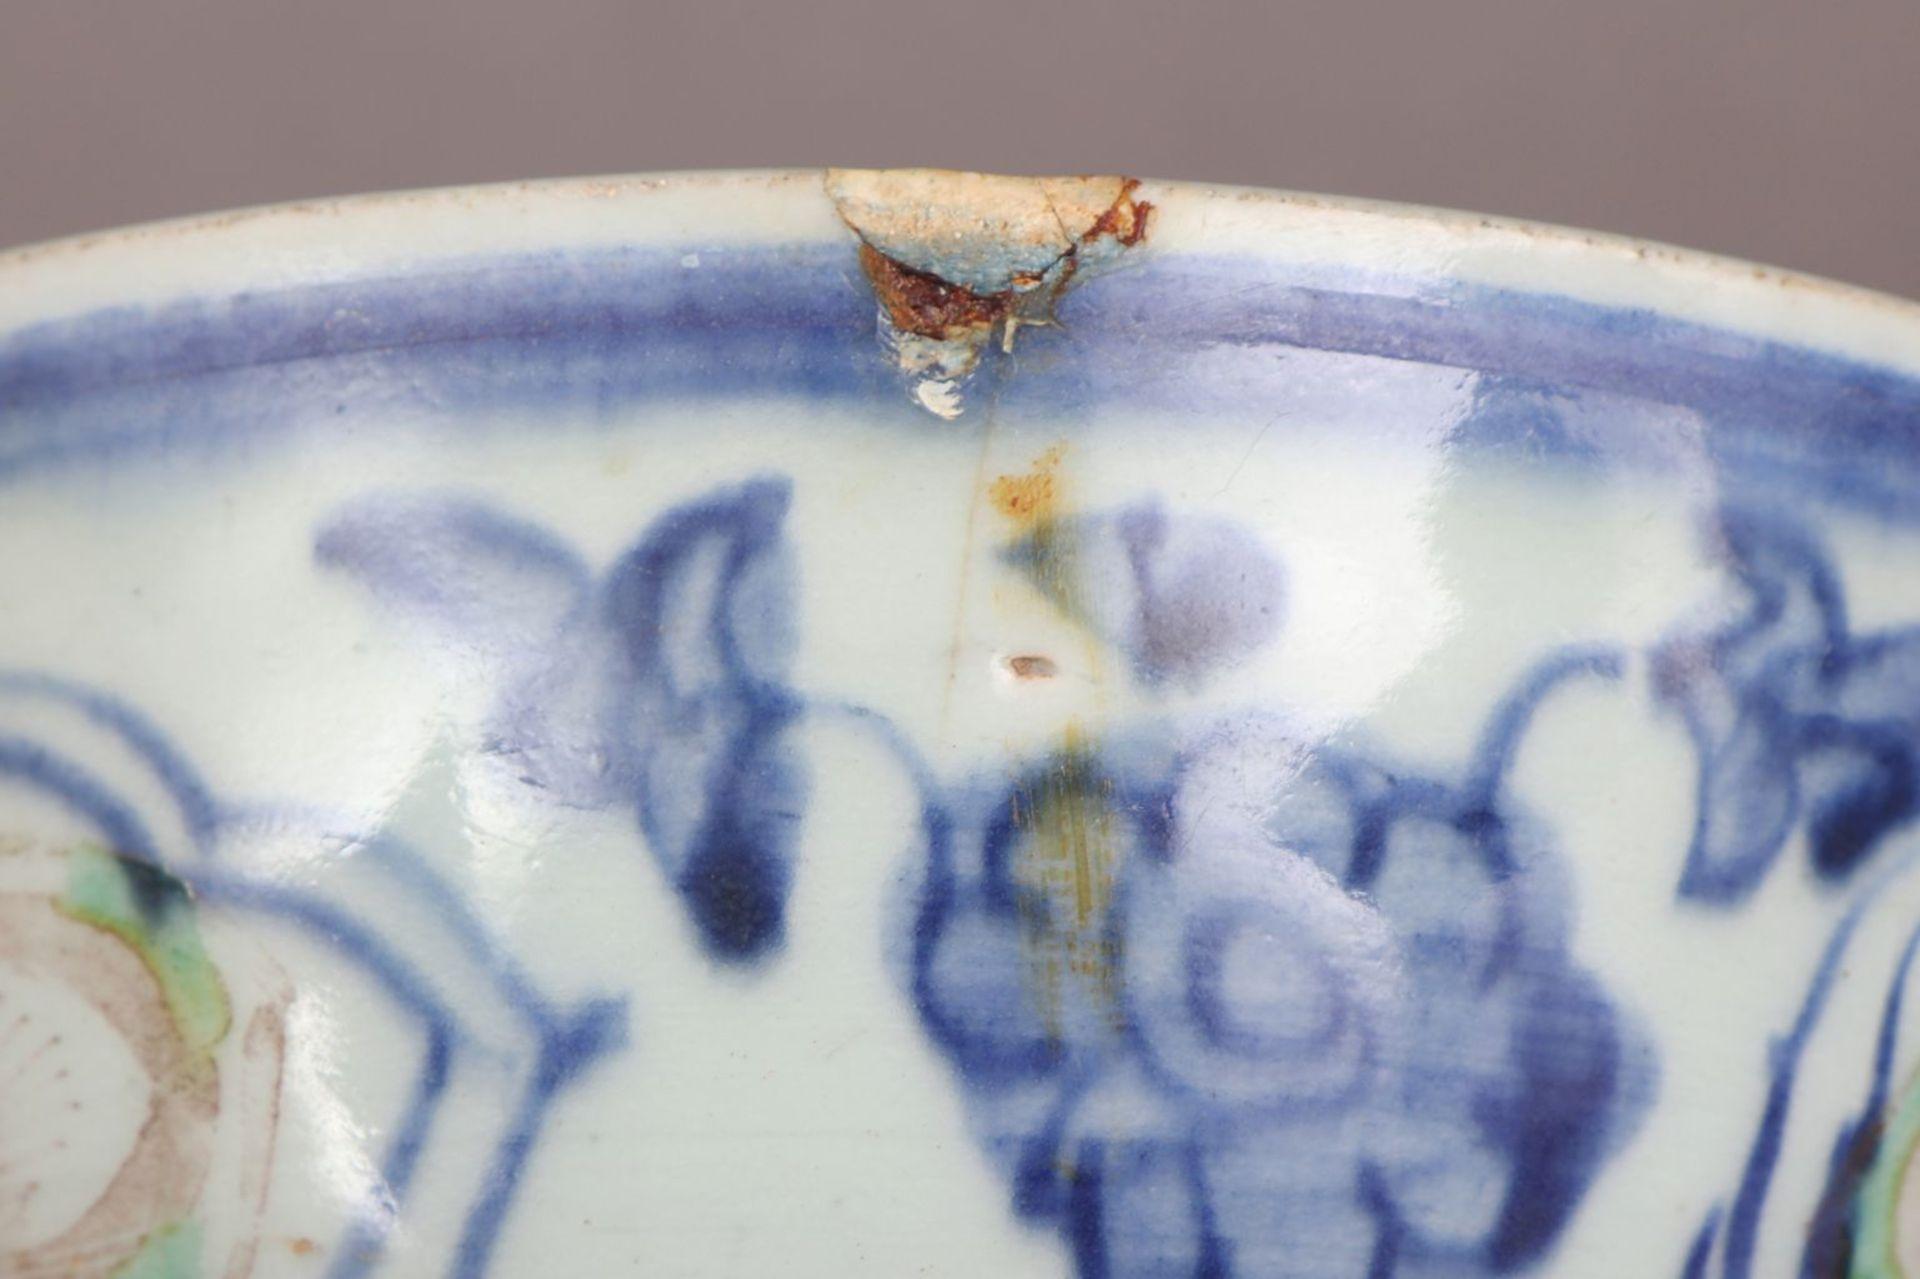 Chinesische Porzellanschale - Image 5 of 5